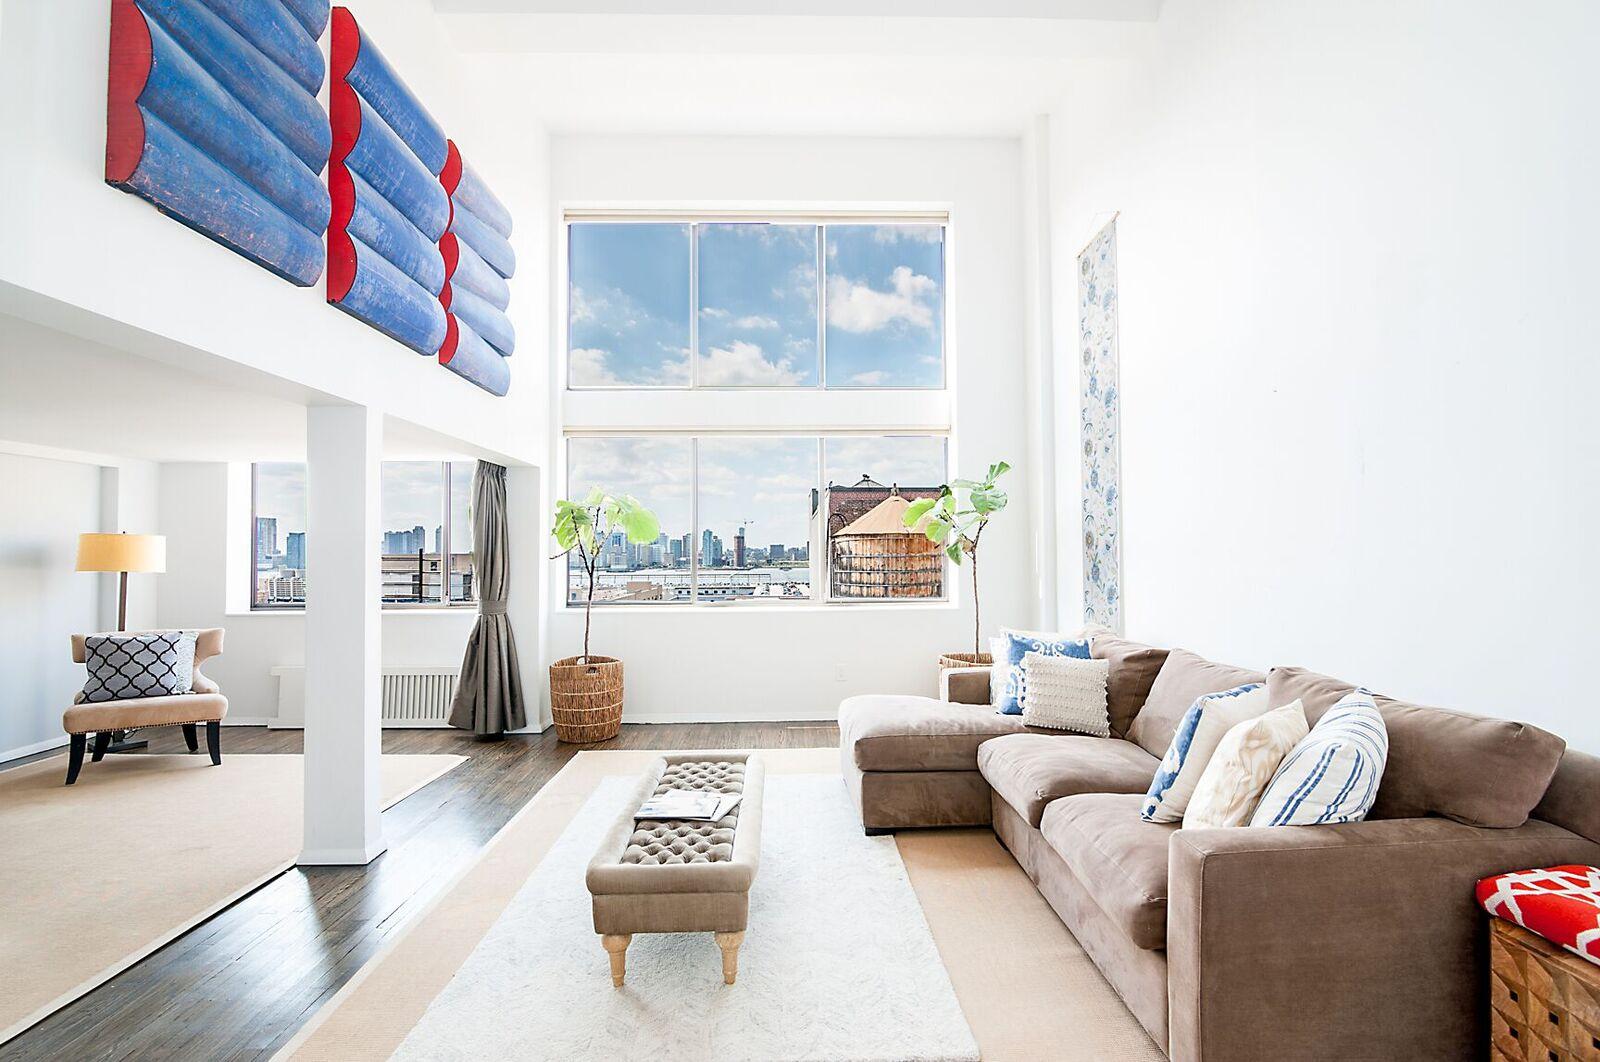 421 Hudson Street #717/718/719 - $8,050,000